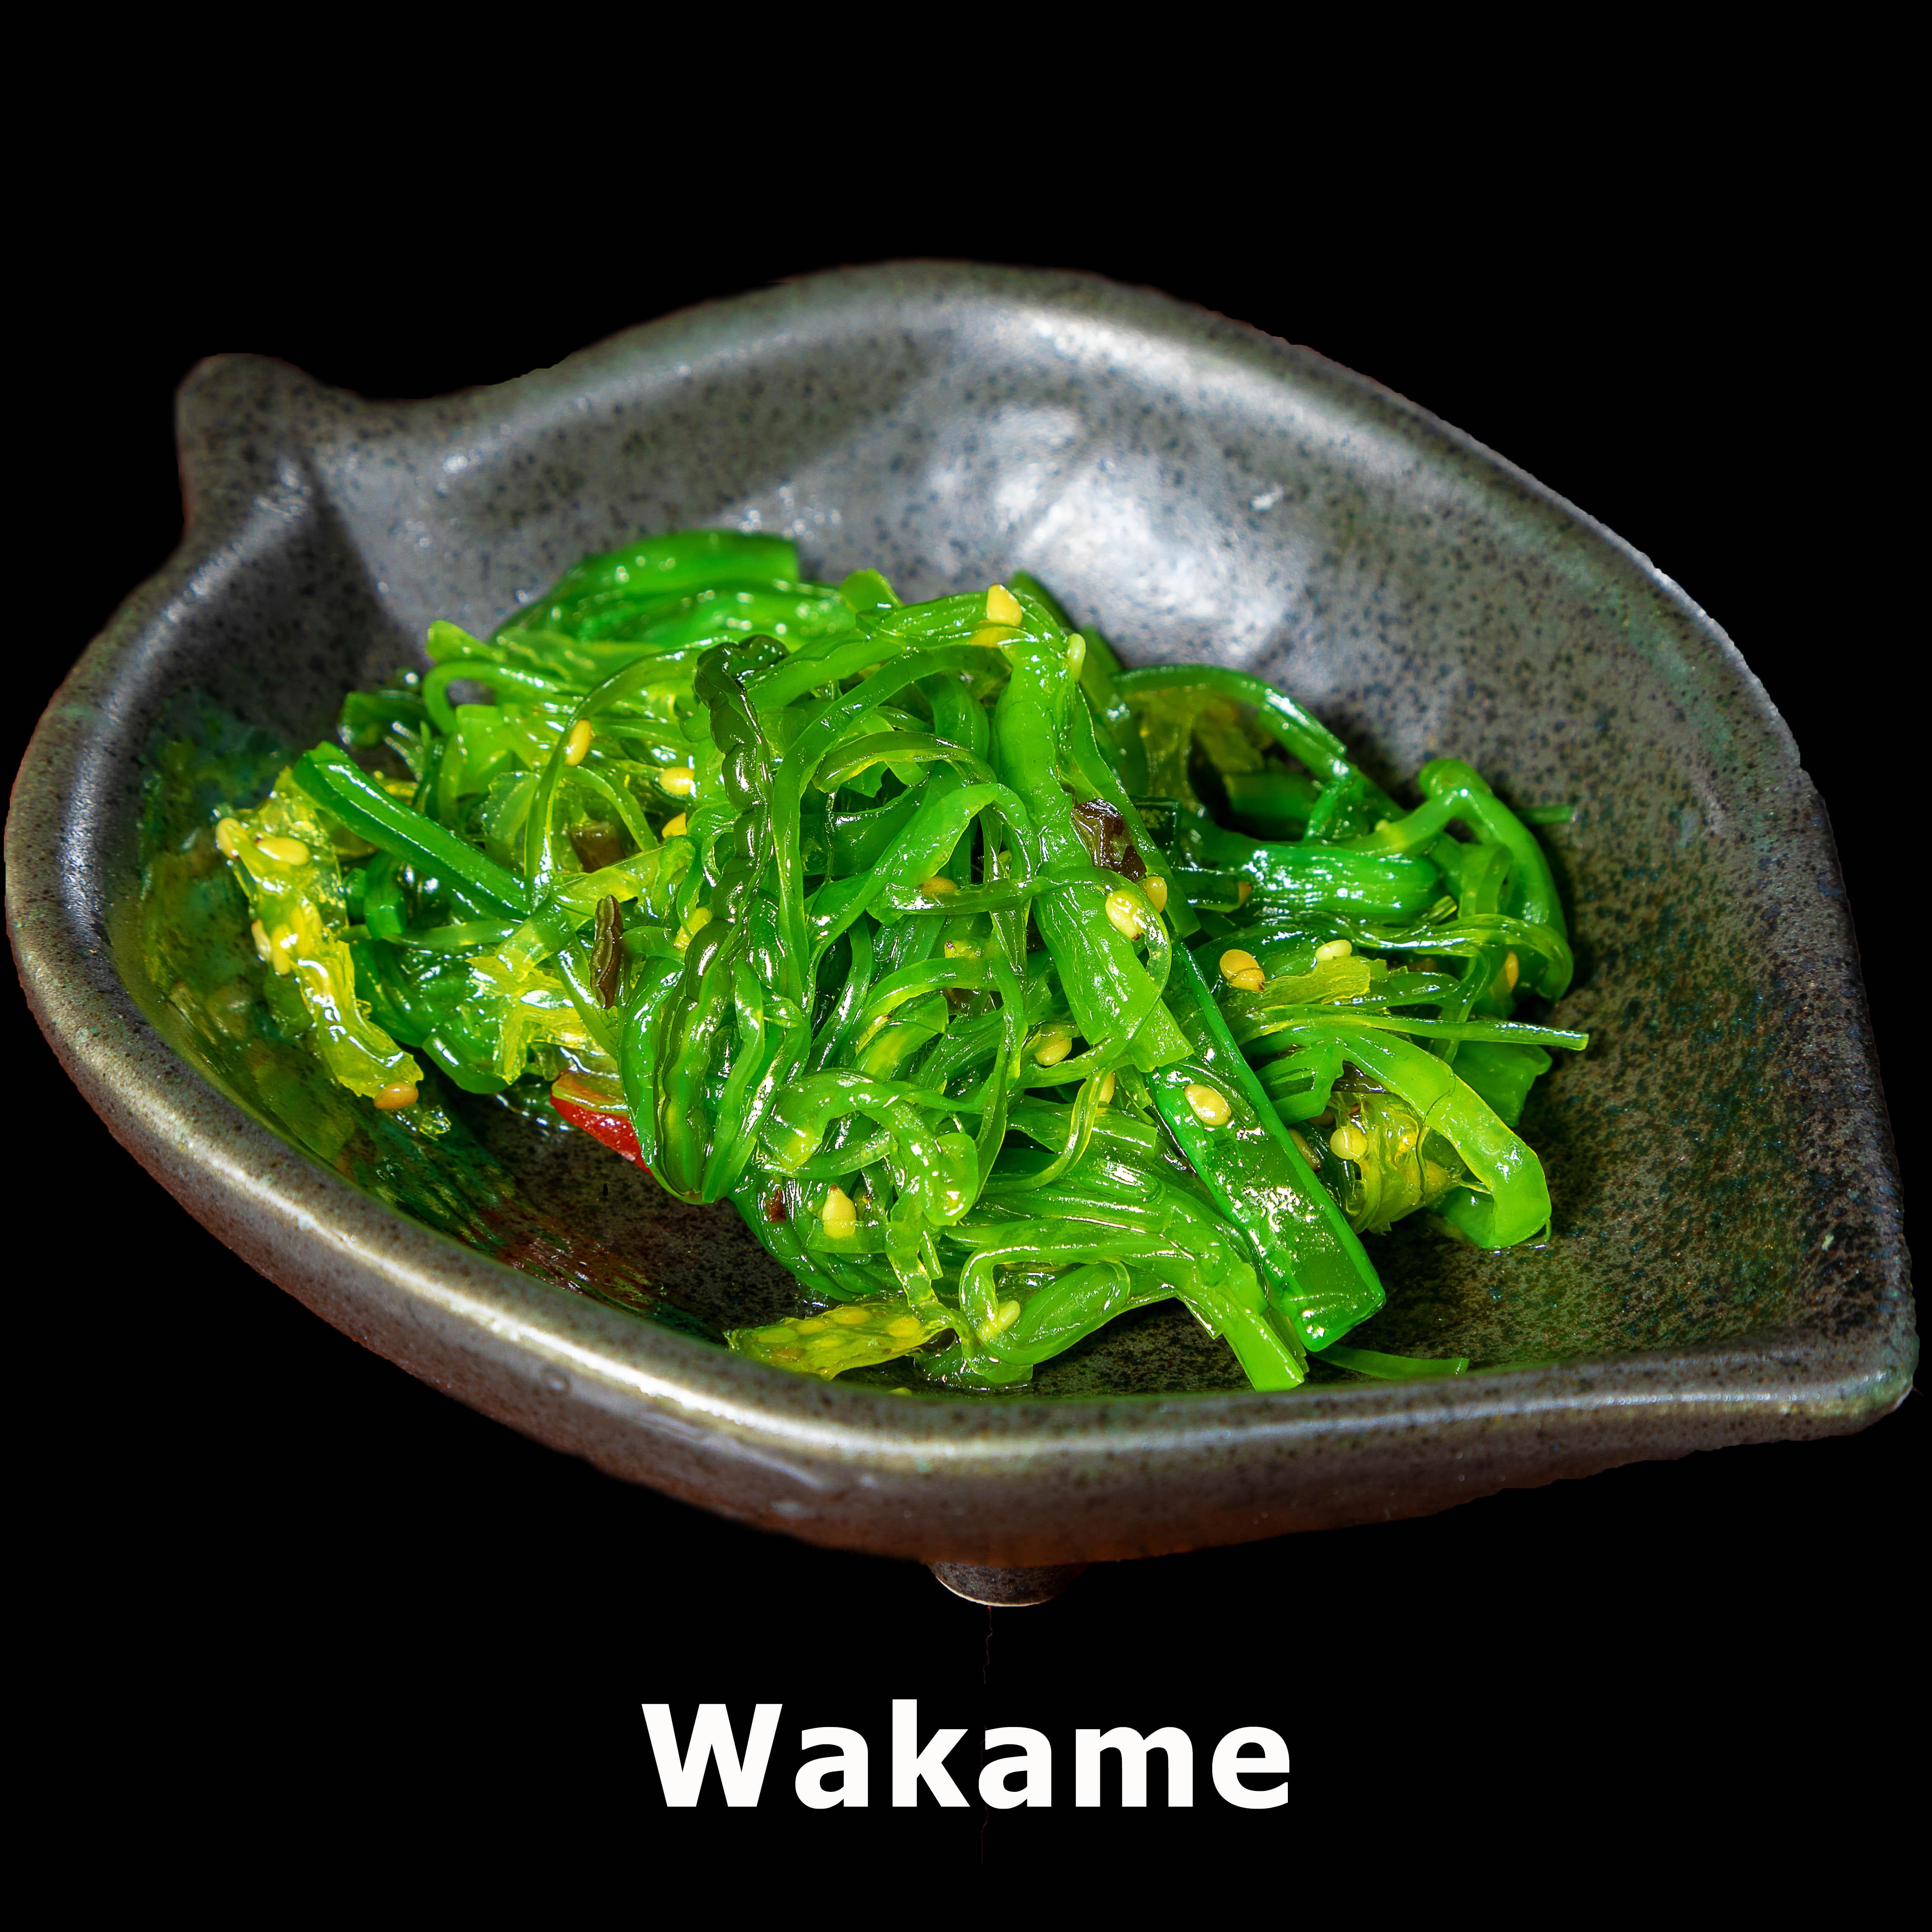 6. Wakame